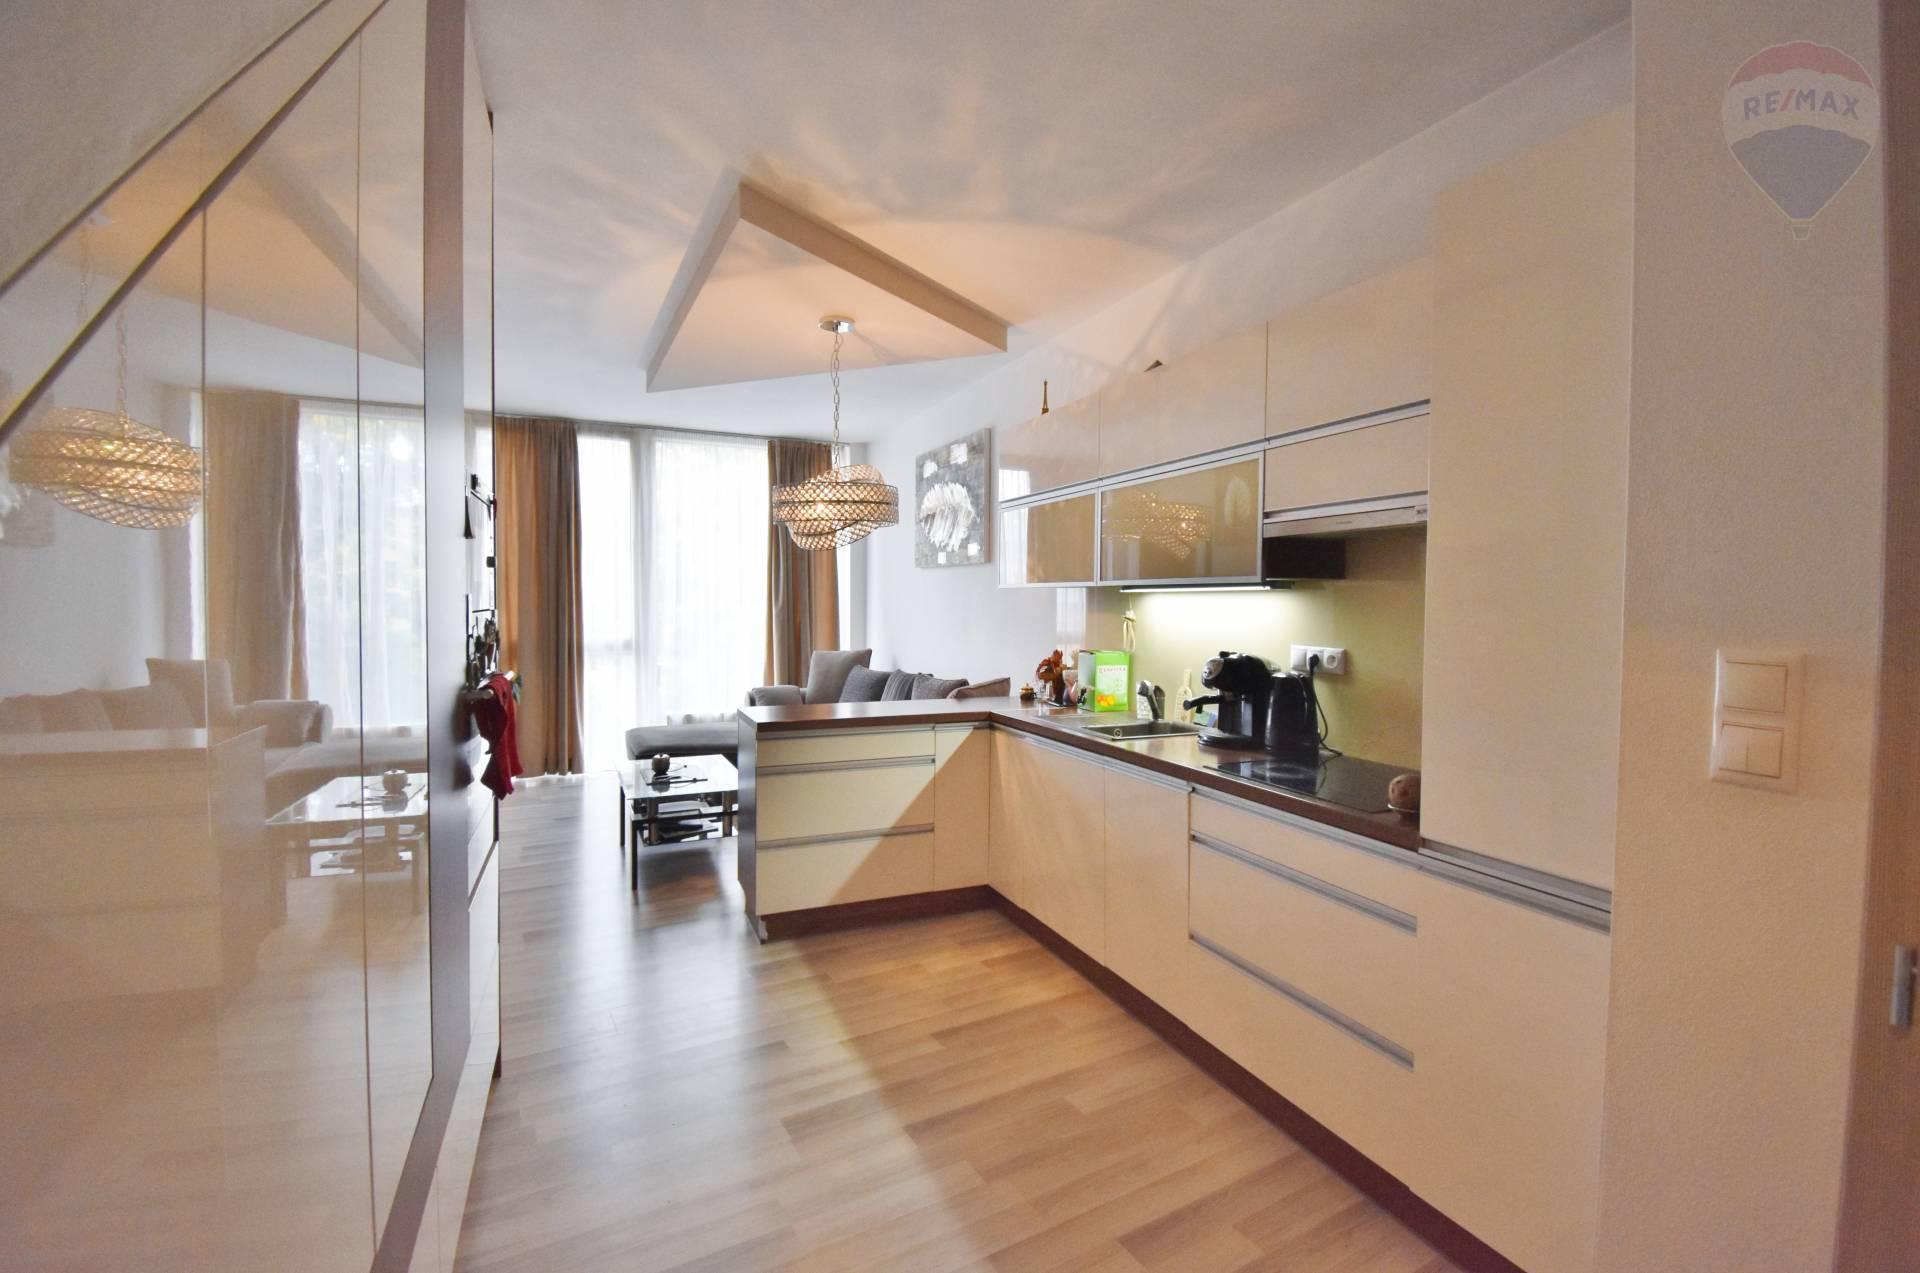 Predaj 2 izbový mezonetový byt , Novostavba, Turecká ulica, Senec, Centrum